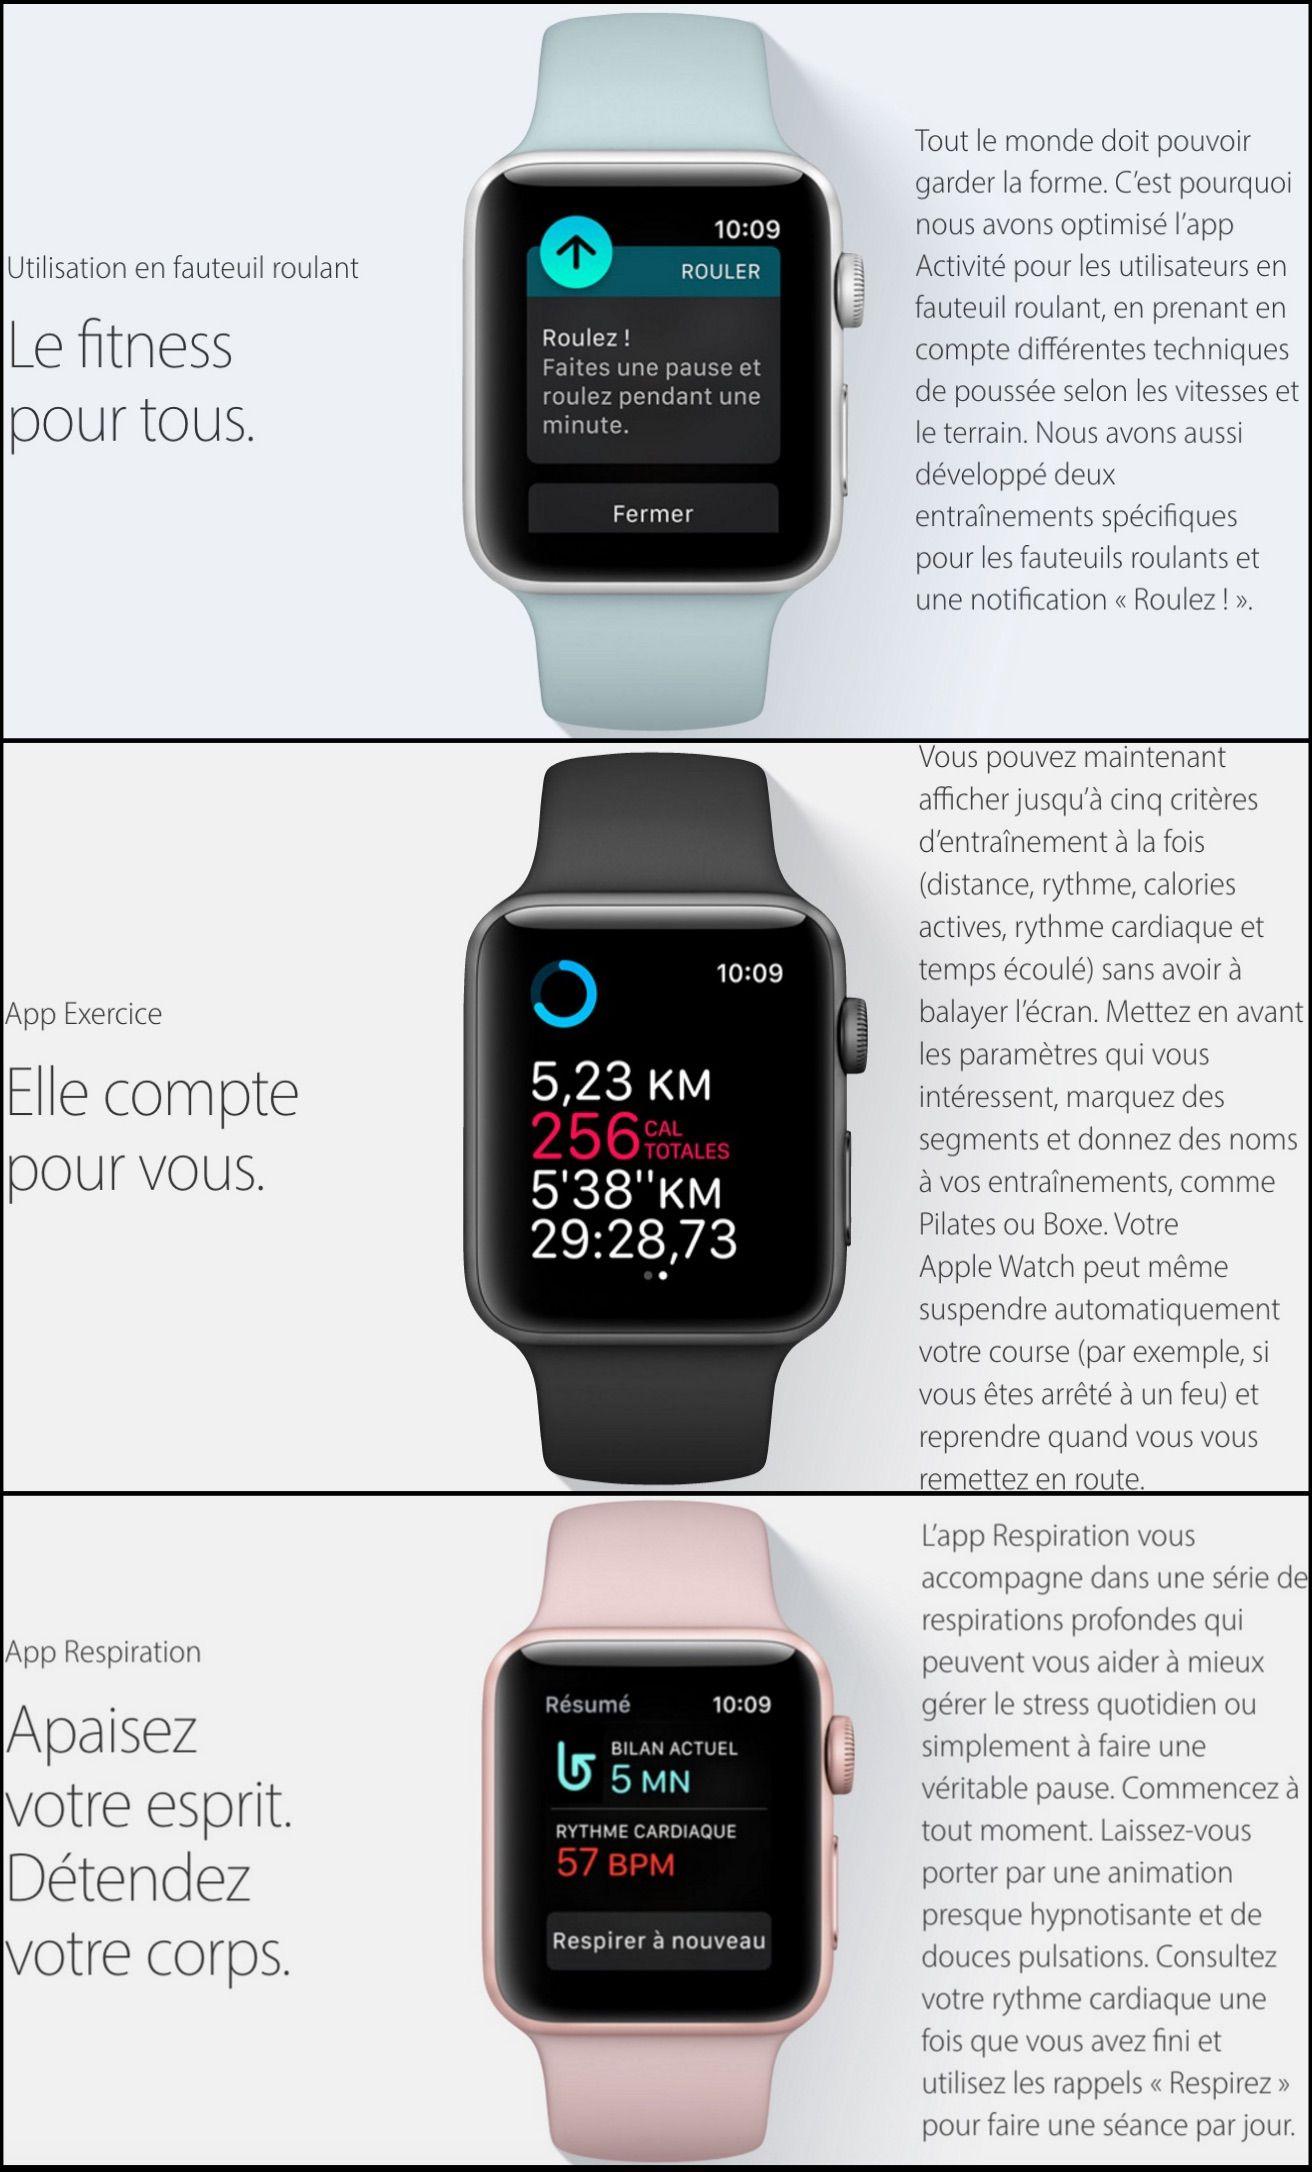 Apple Watch OS 3 montre connectee-maison connectee